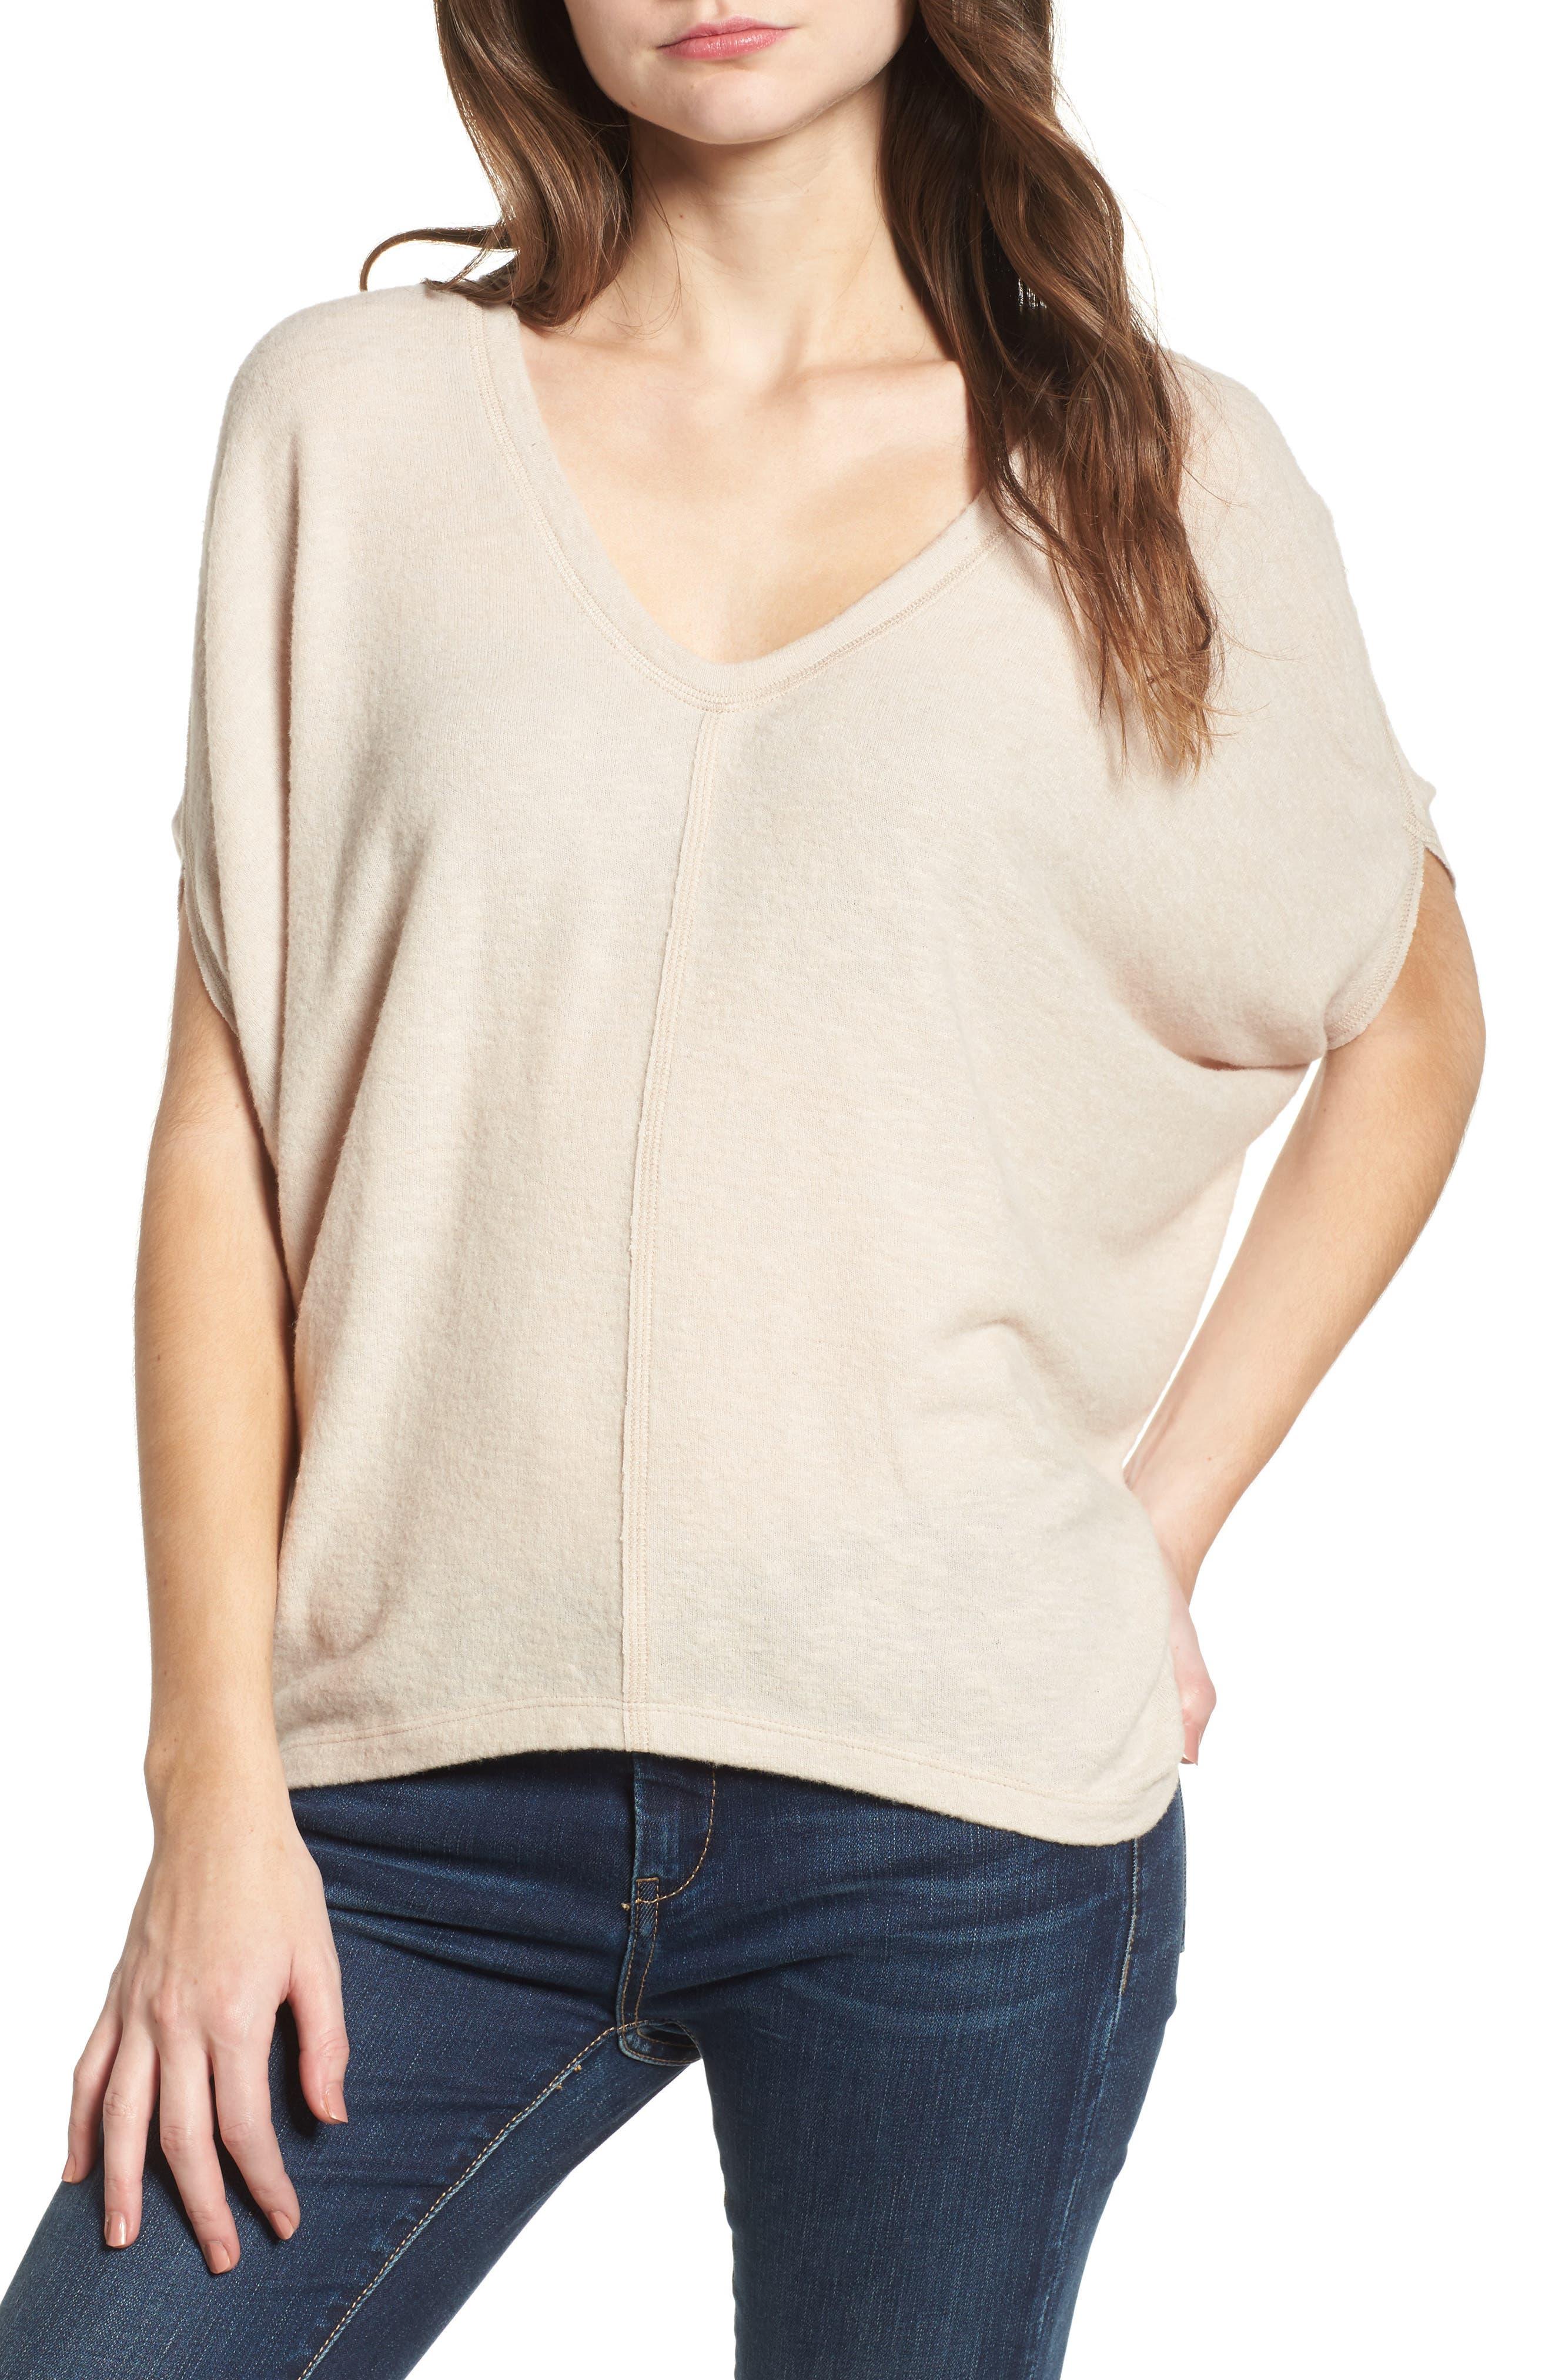 Cocoon Top,                         Main,                         color, 250